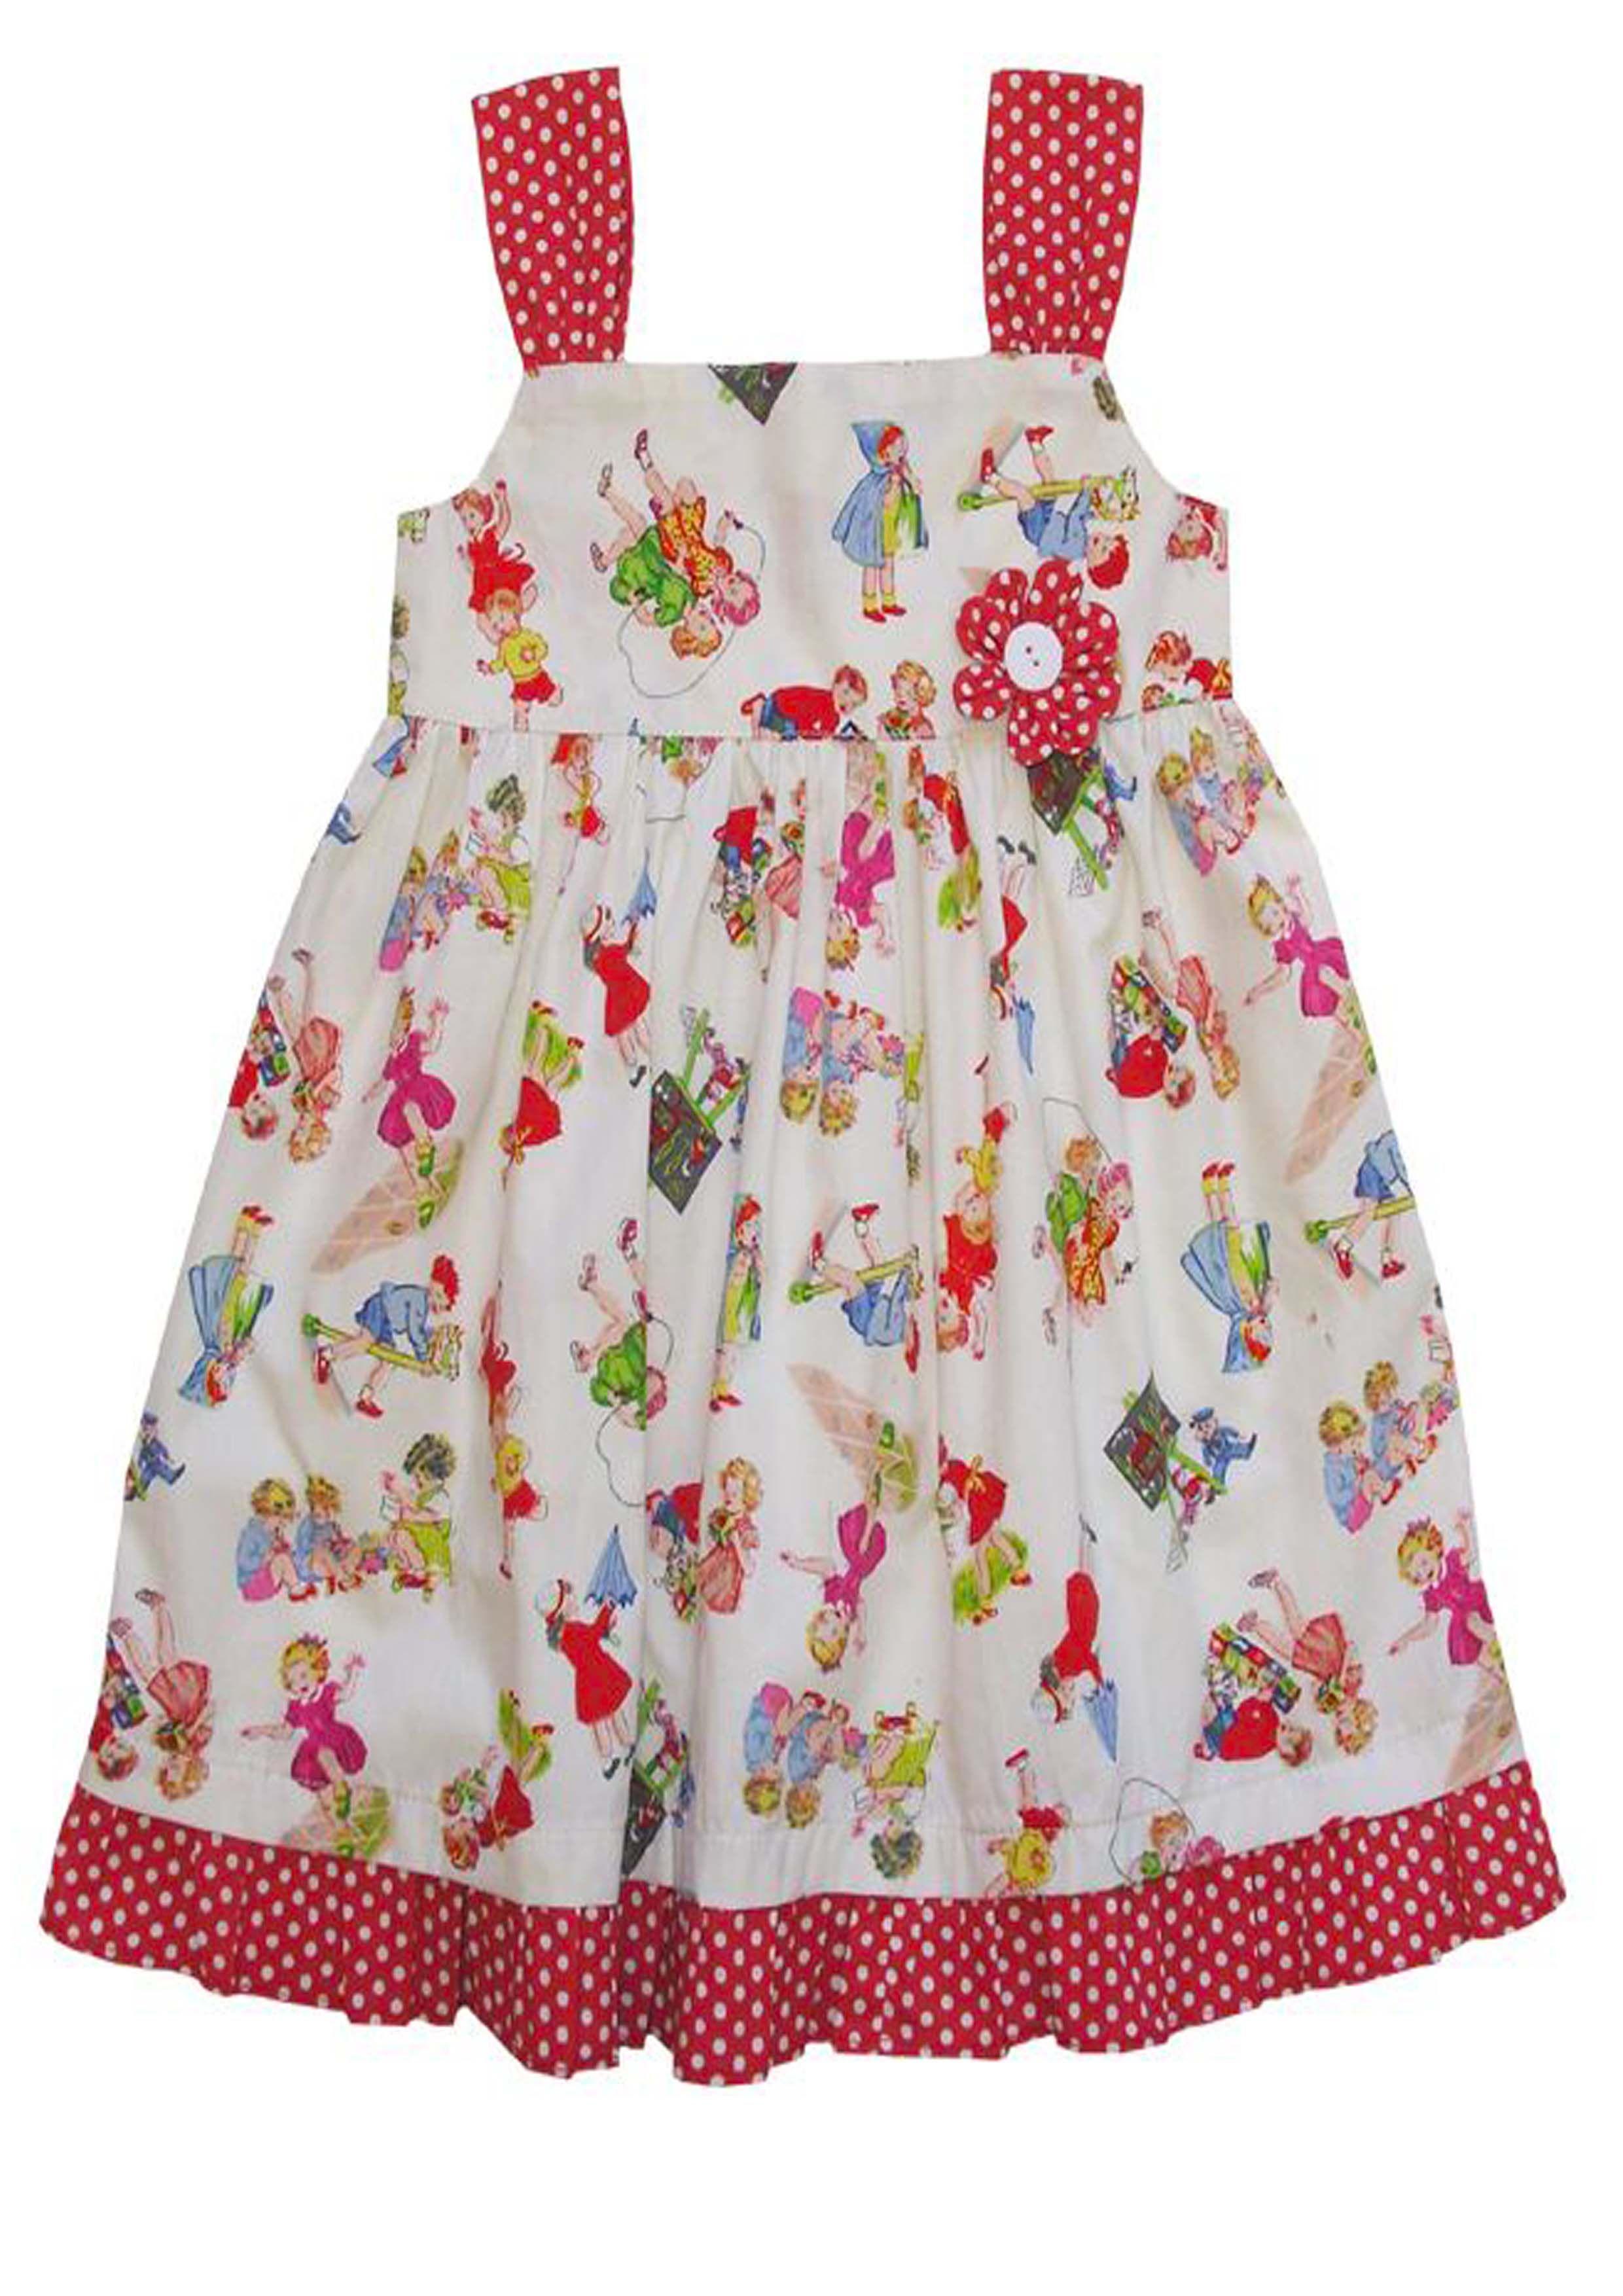 3 stylish Toddler dress for baby girl deas Kids Frocks